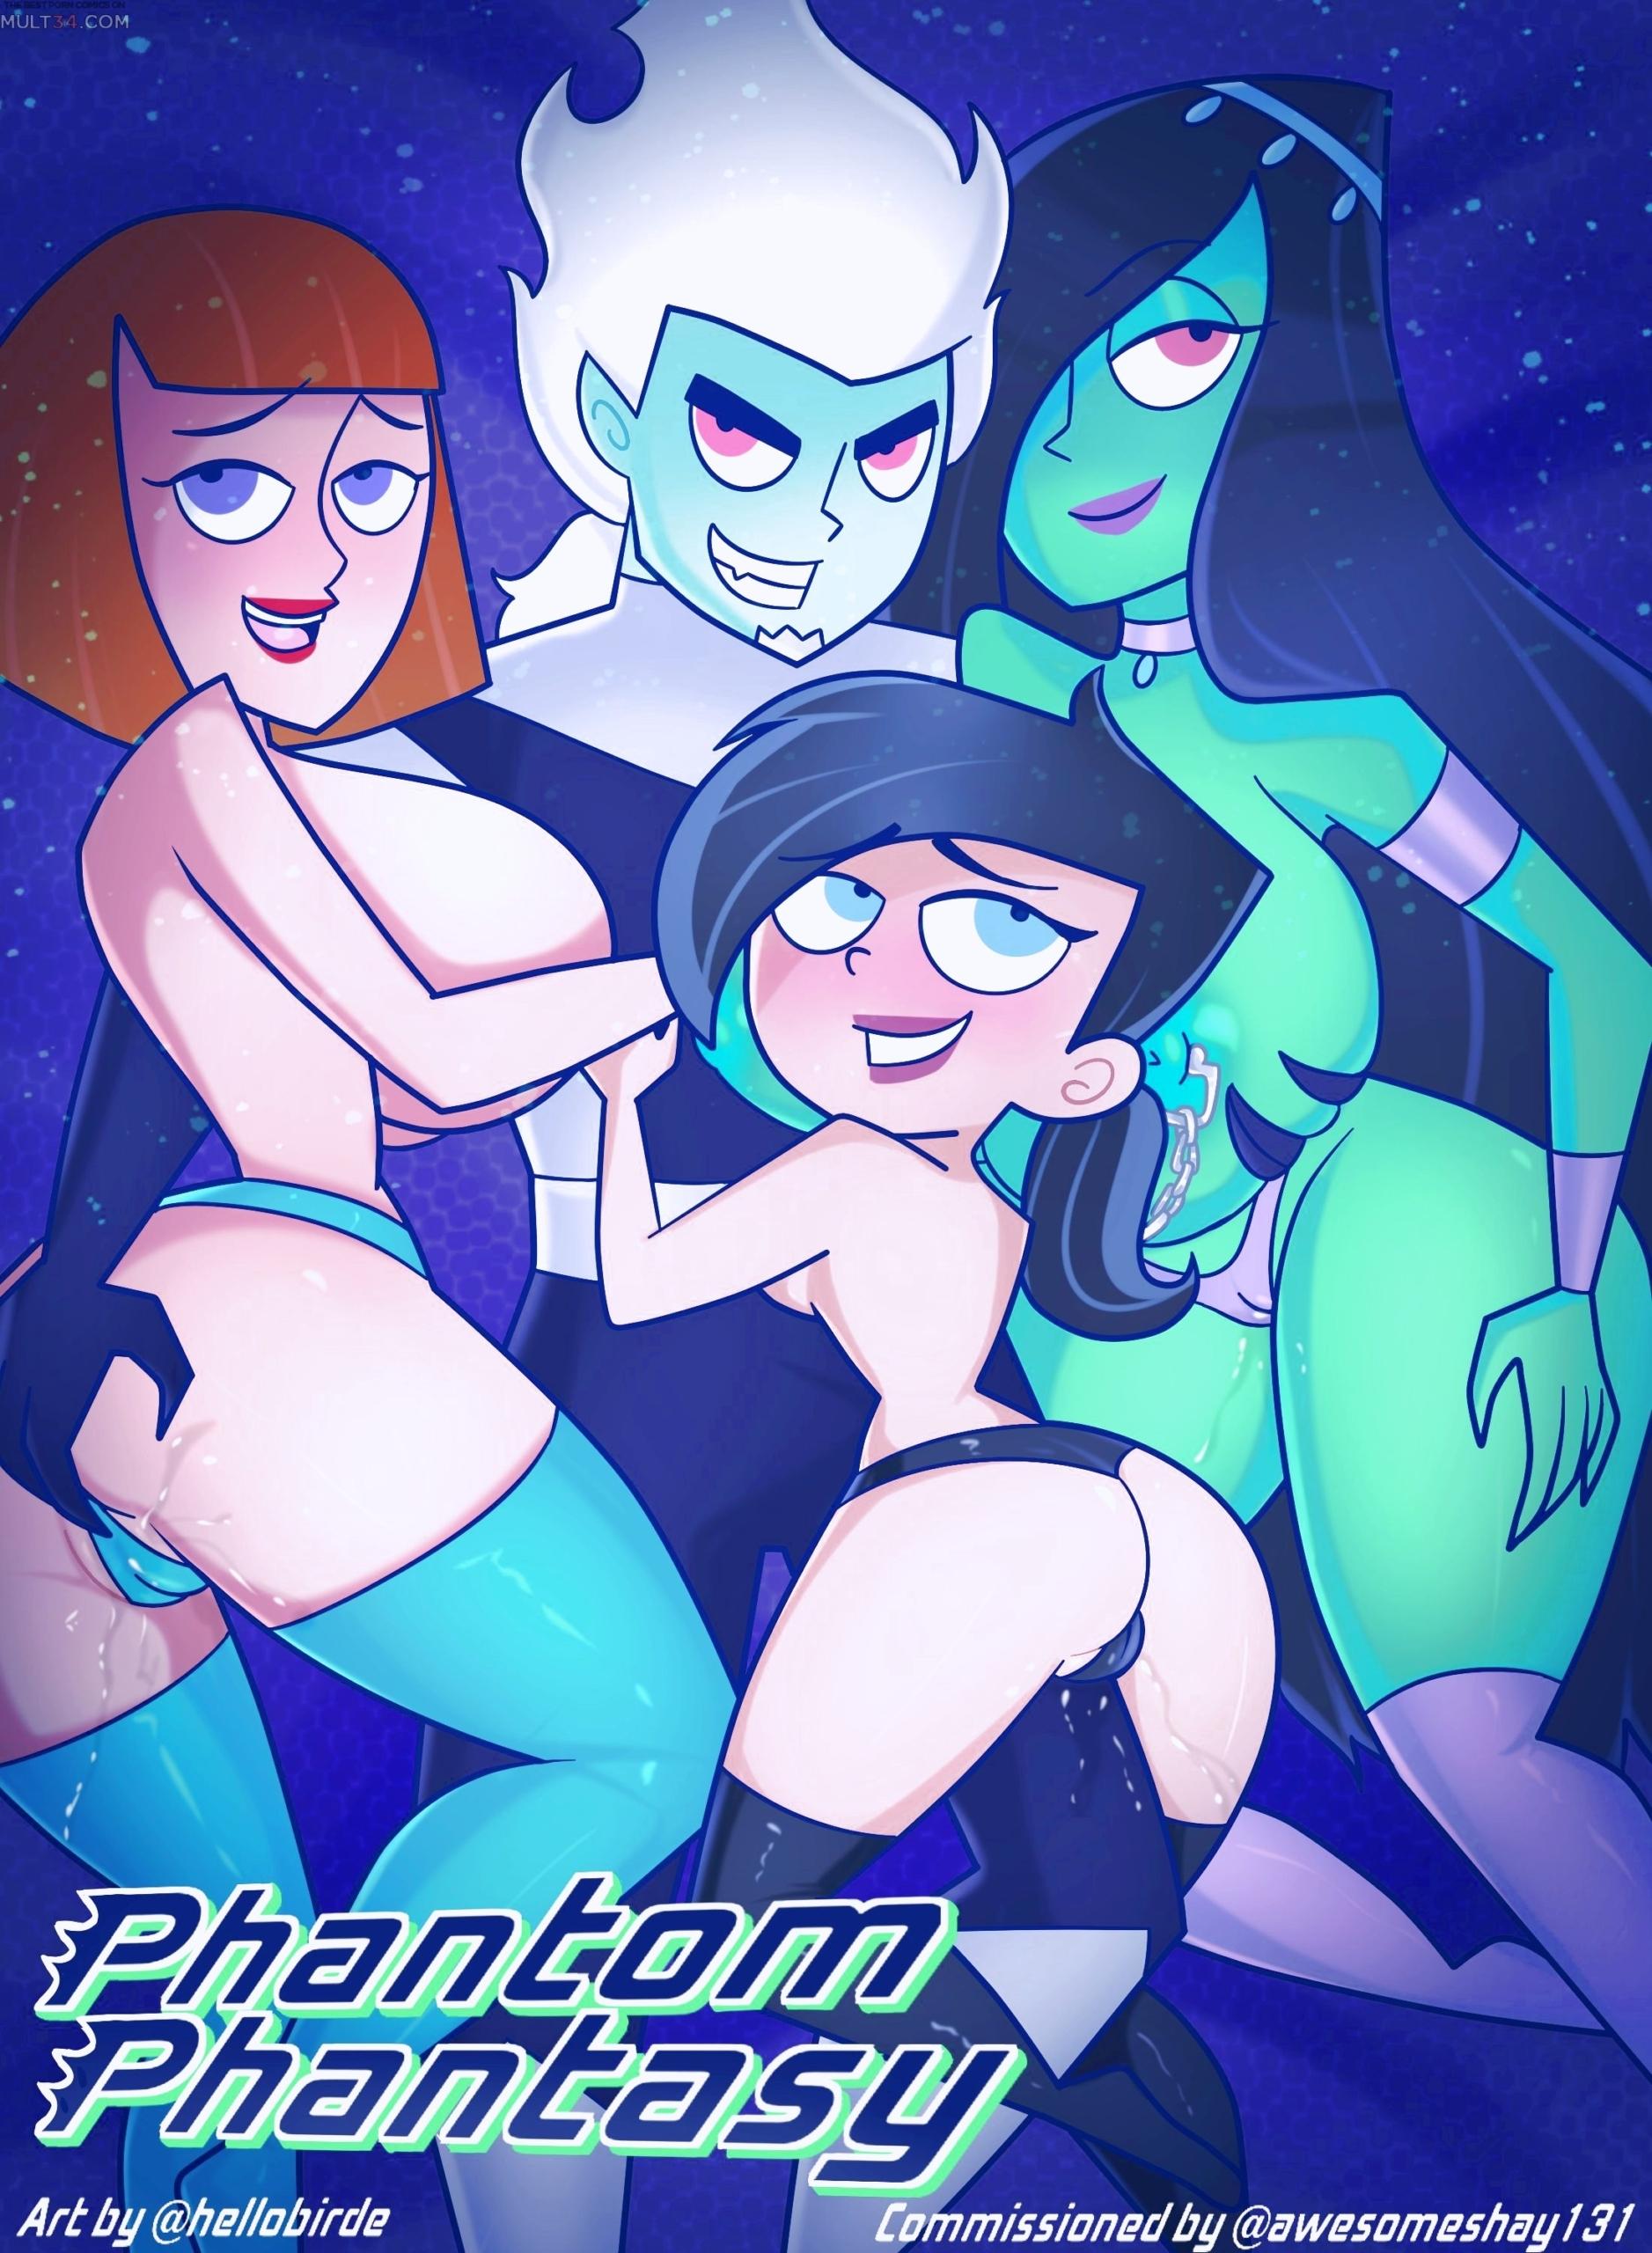 Comic danny porn phantom Milfing the